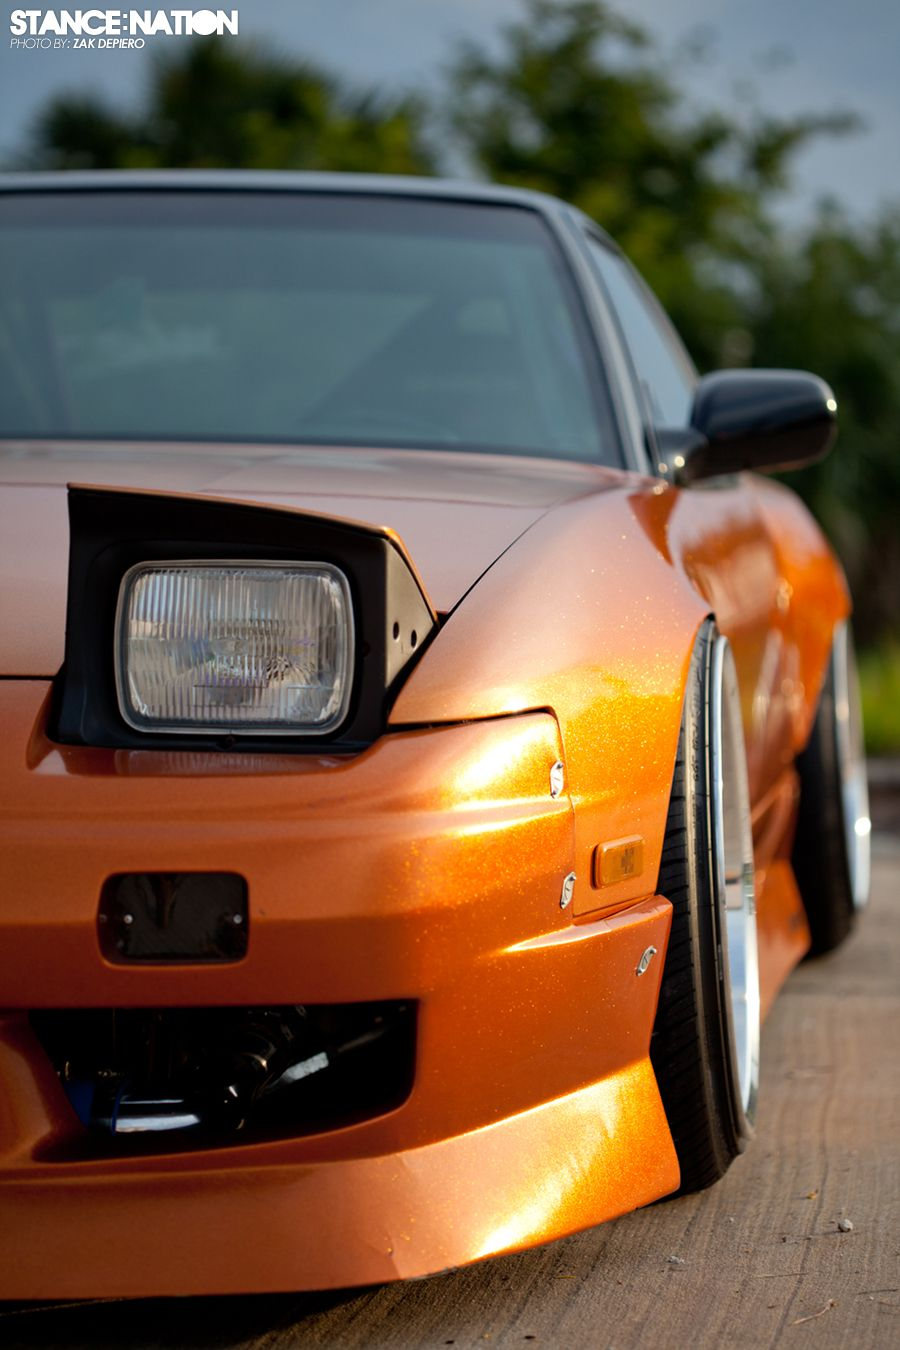 Drift Car iPhone Wallpapers - Top Free Drift Car iPhone ...